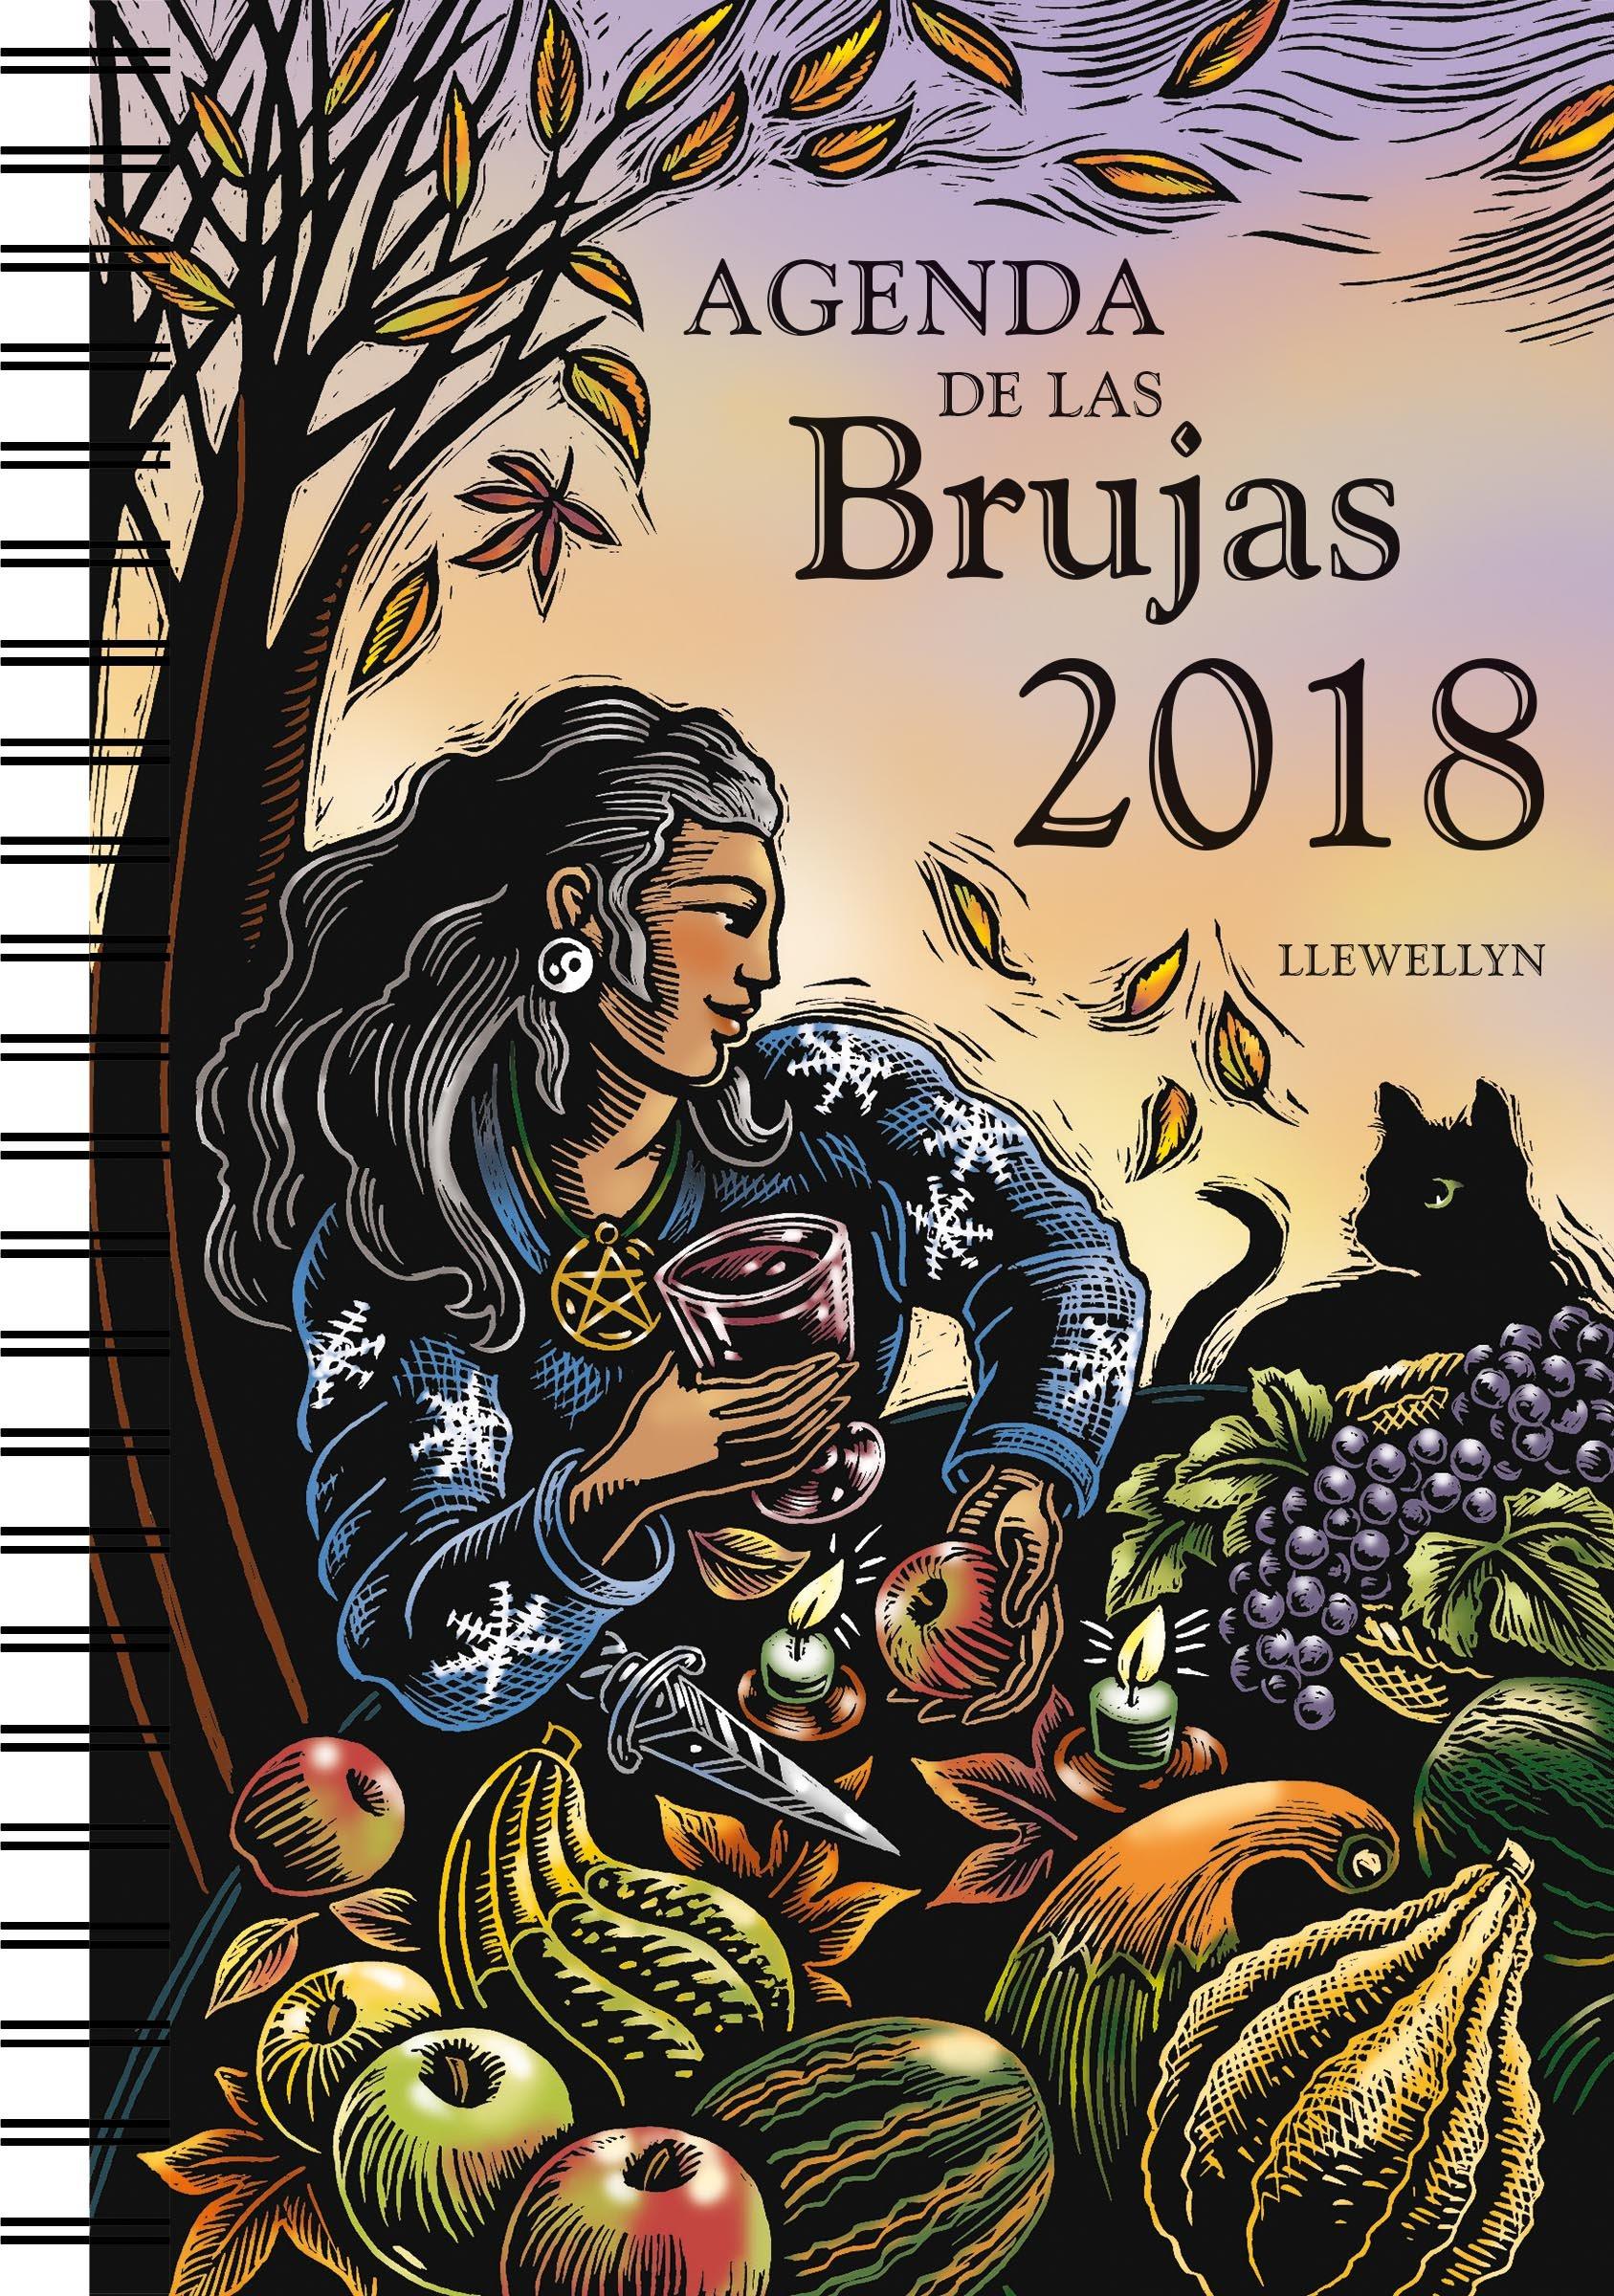 Agenda de las brujas 2018 (Spanish Edition): Llewellyn ...